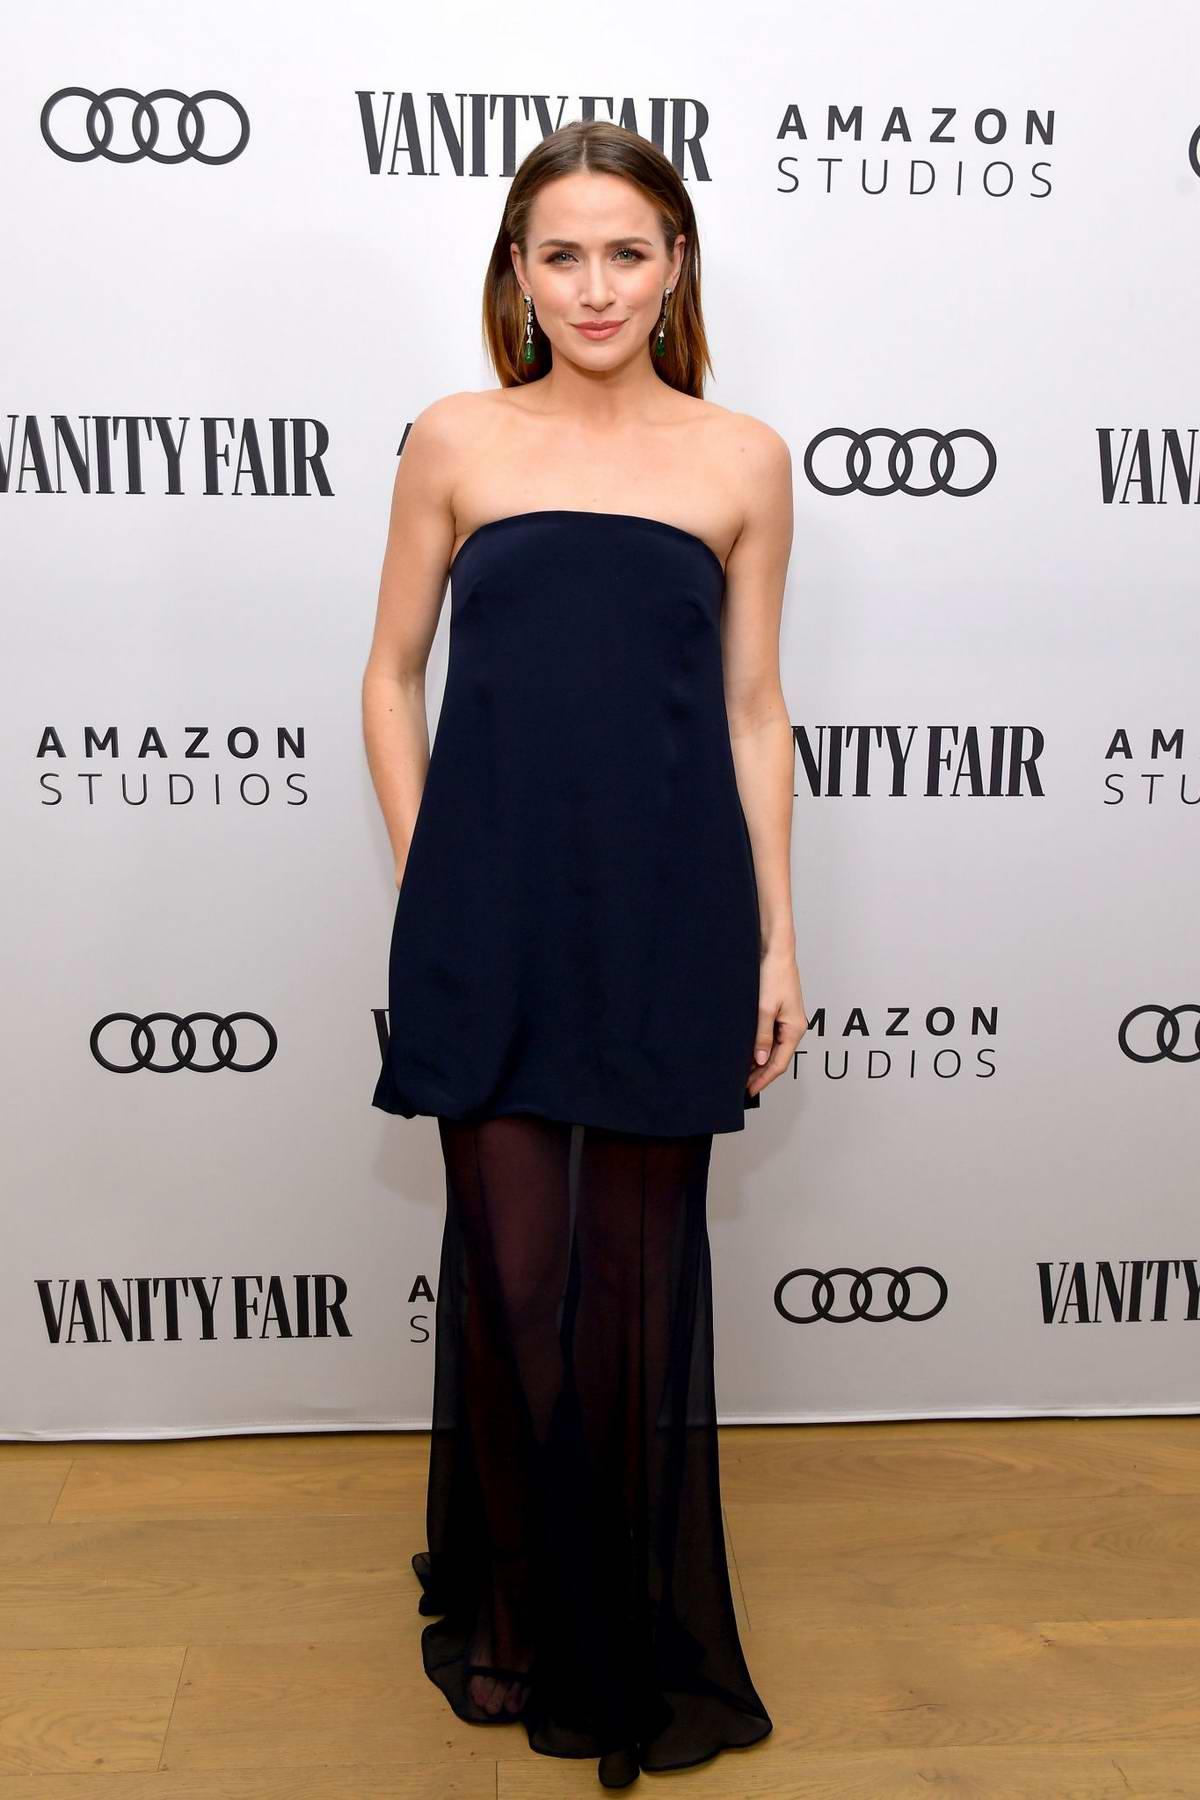 Shantel VanSanten attends The Vanity Fair x Amazon Studios 2020 Awards Season Celebration in West Hollywood, California